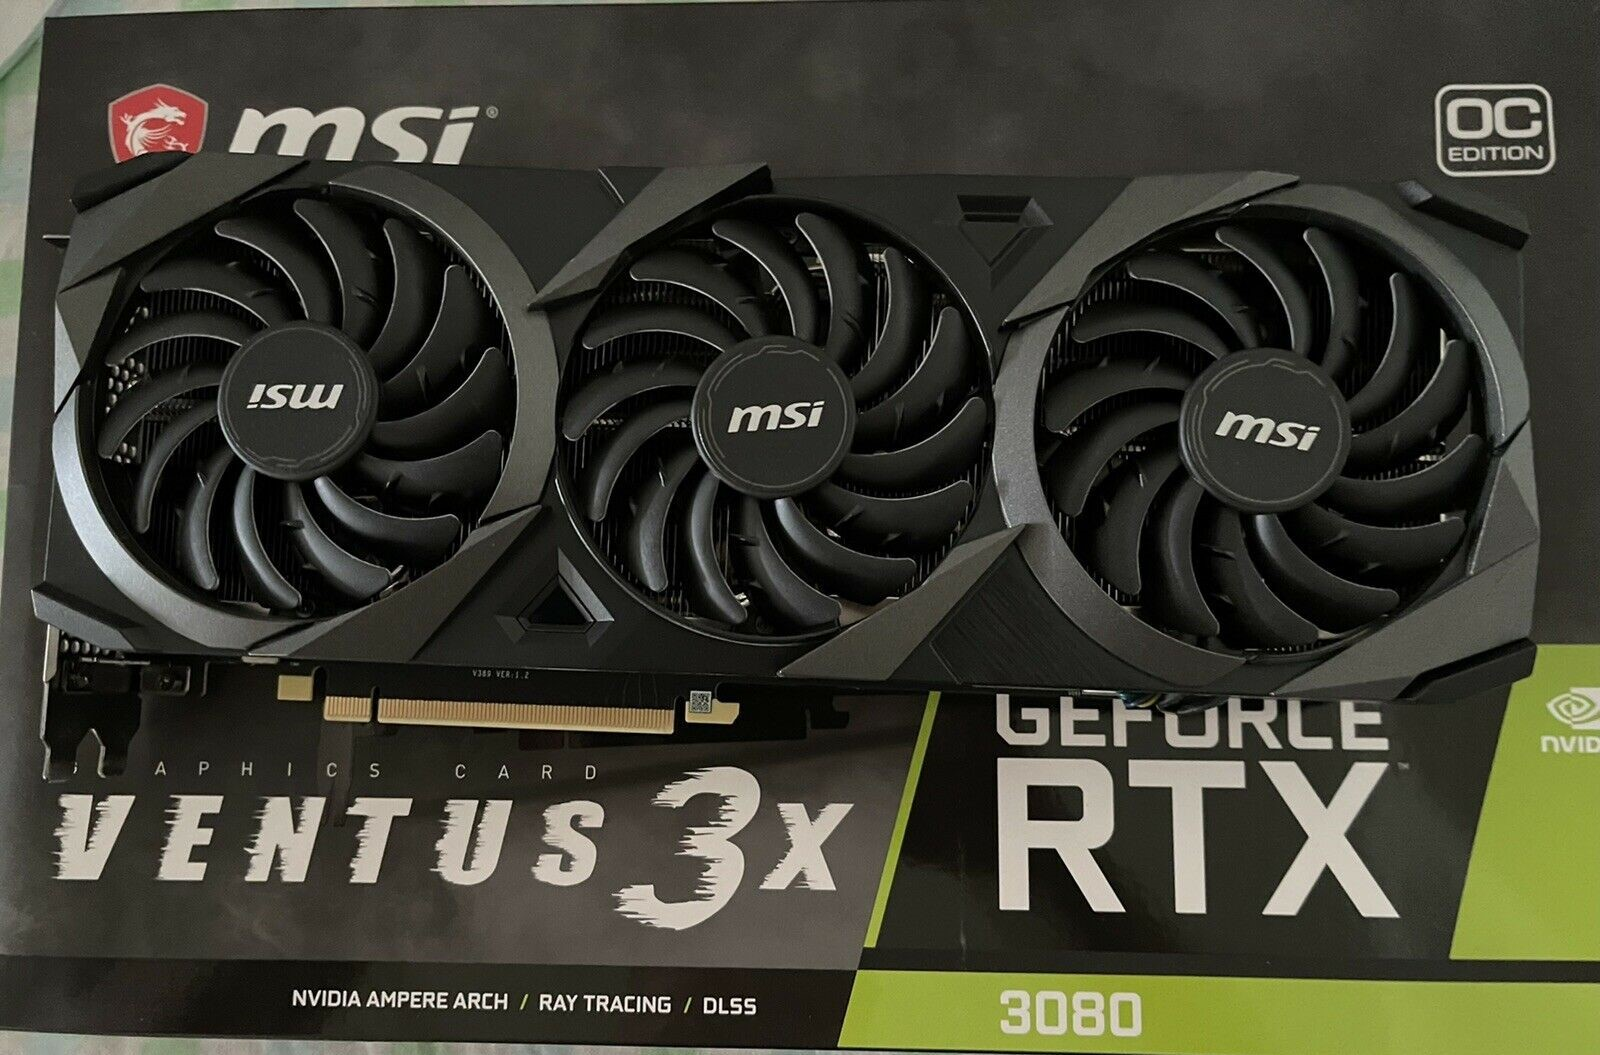 GEFORCE RTX 3090, RTX 3080, RTX 3080 TI, RTX 3070